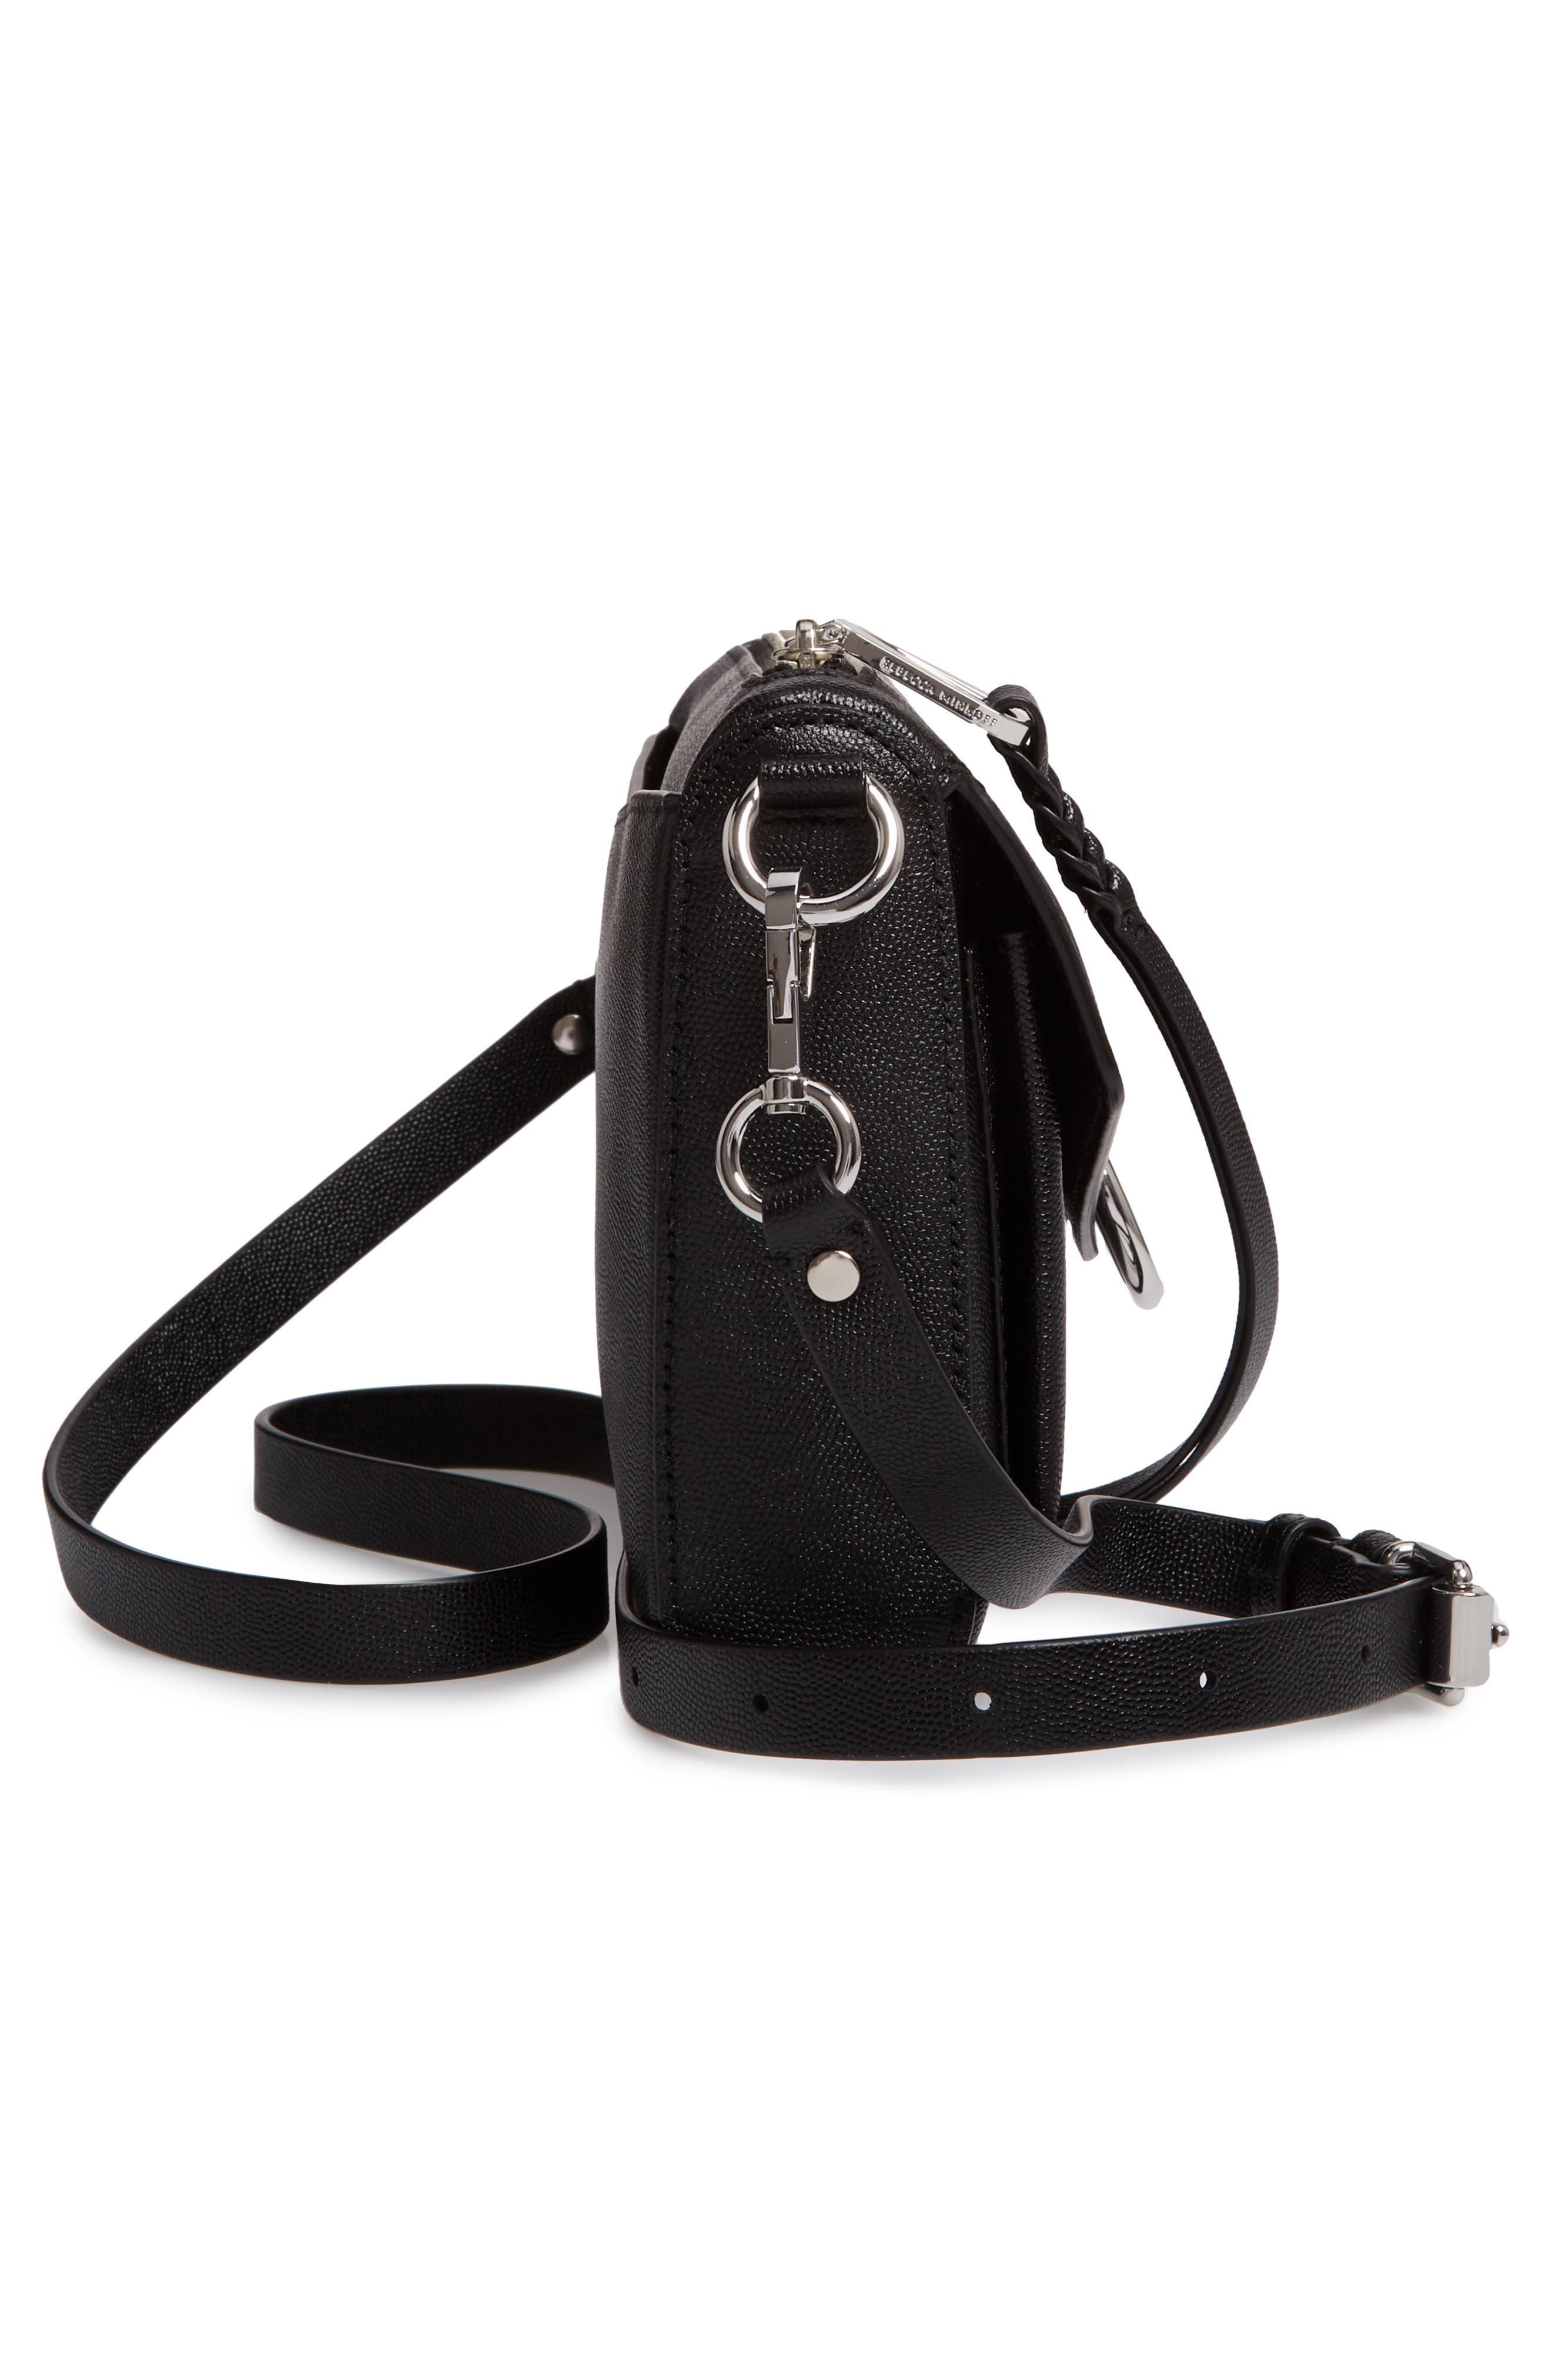 Jean MAC Convertible Crossbody Bag,                             Alternate thumbnail 5, color,                             BLACK